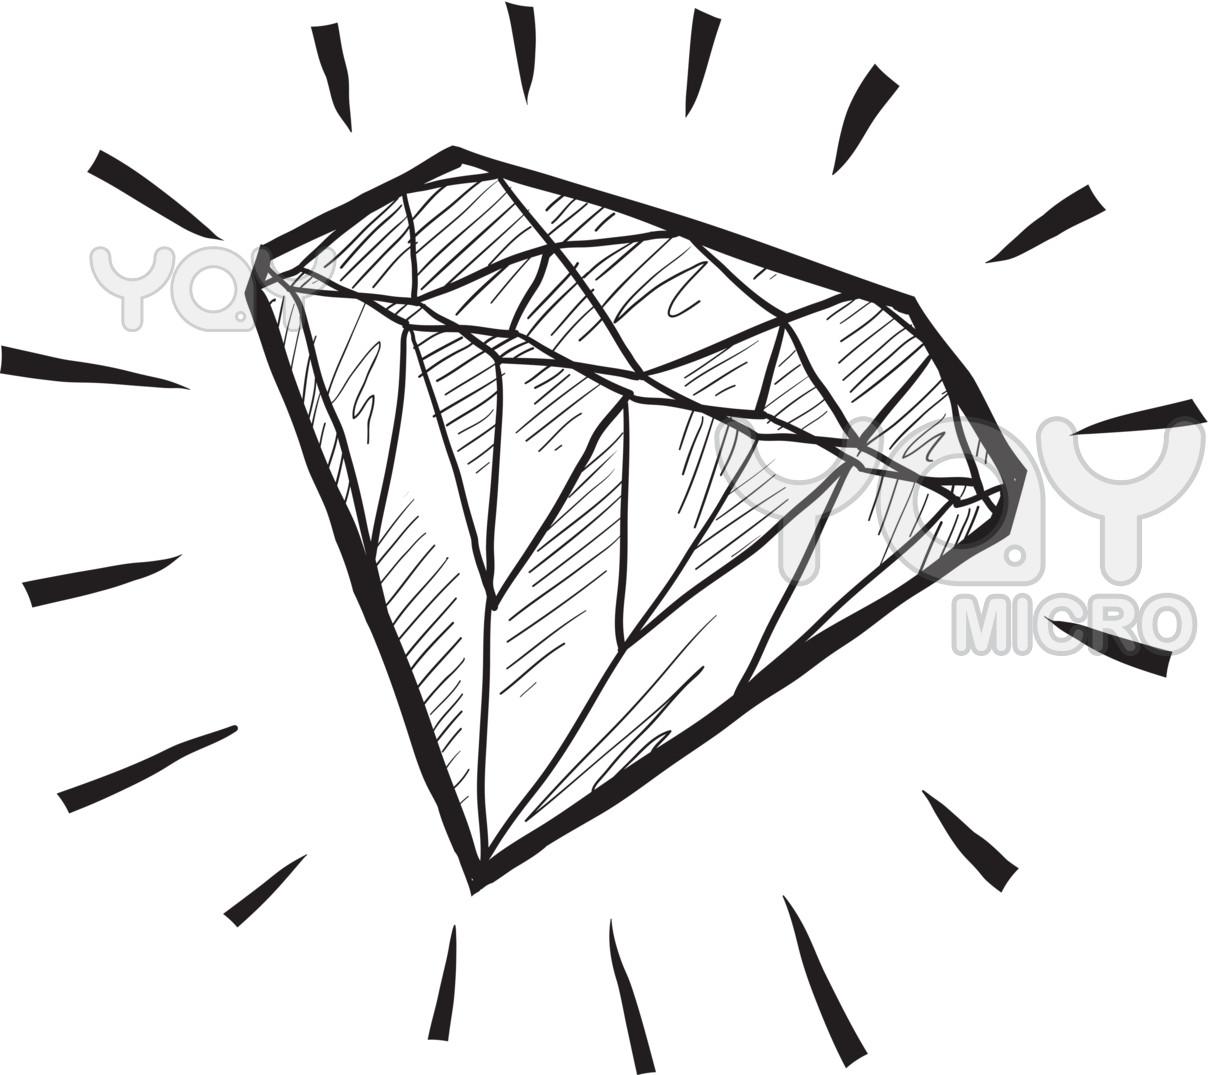 1210x1075 Cool Easy Drawings Tumblr Drawing Of A Diamond Art Ideas Beautiful